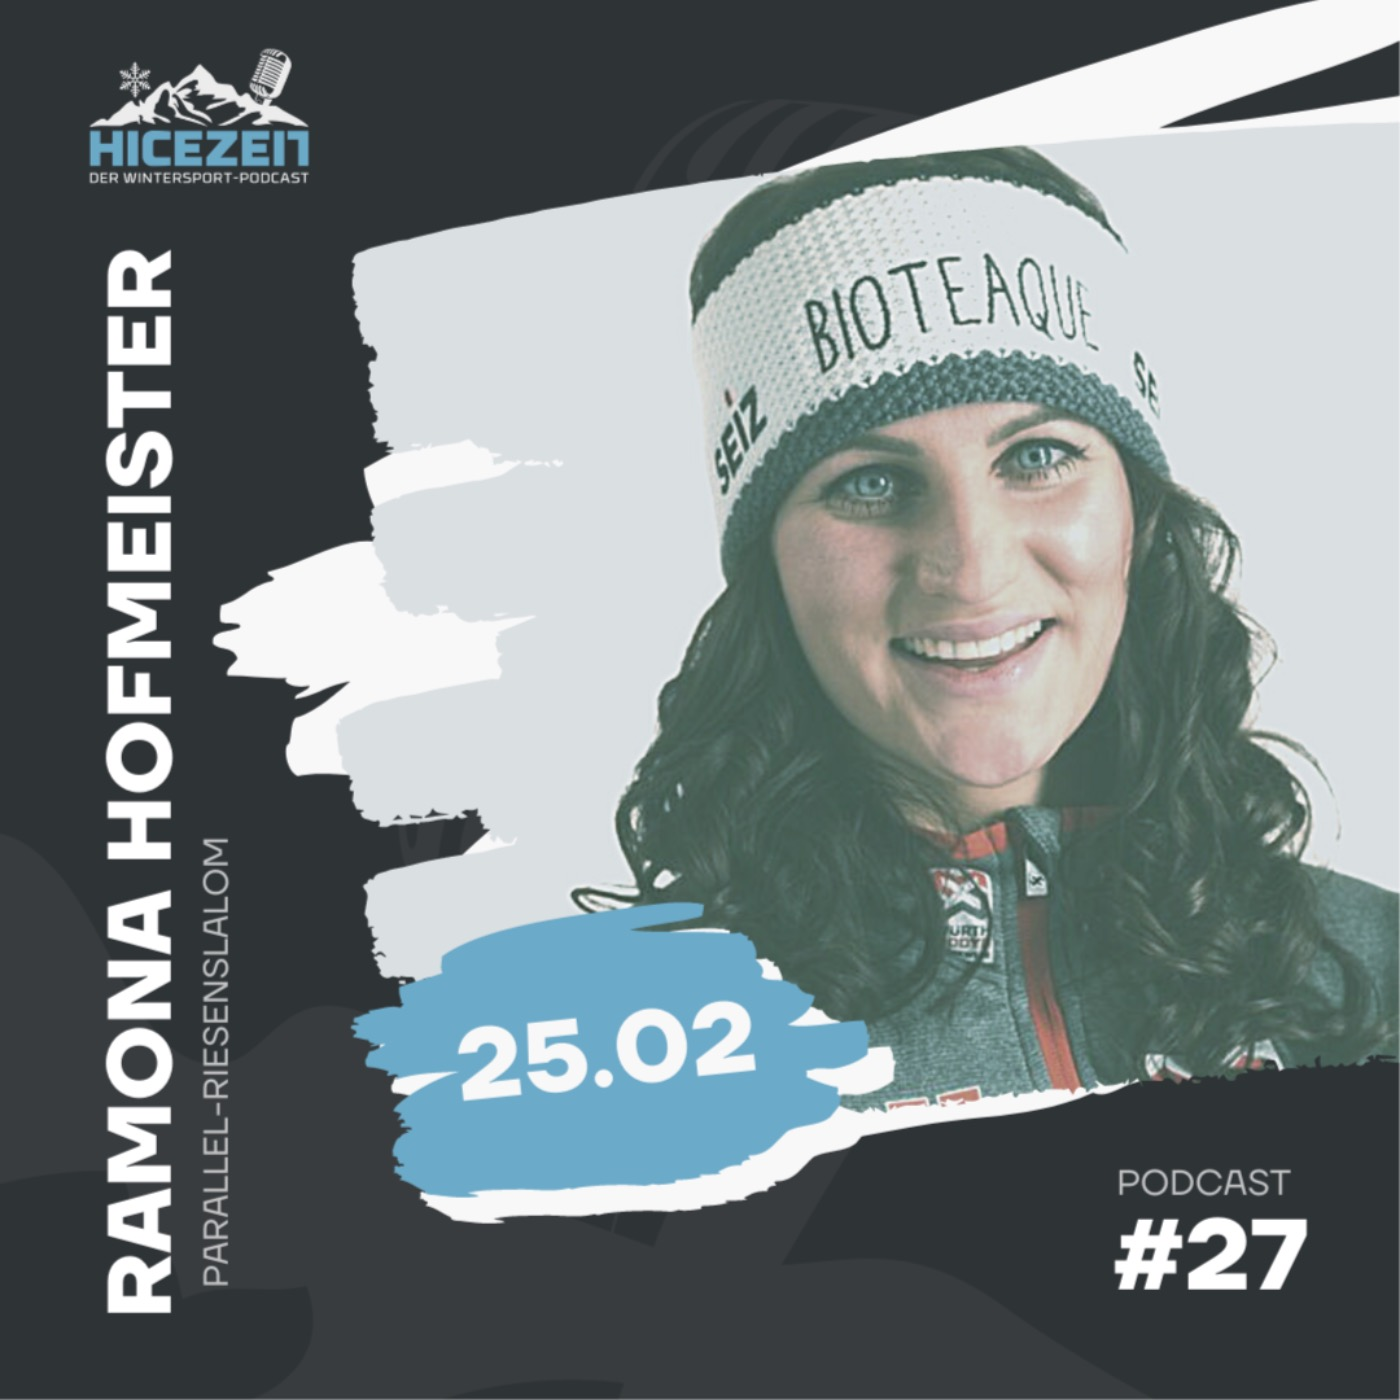 Ramona Hofmeister, Parallel-Riesenslalom, Der Wintersport-Podcast Folge 27